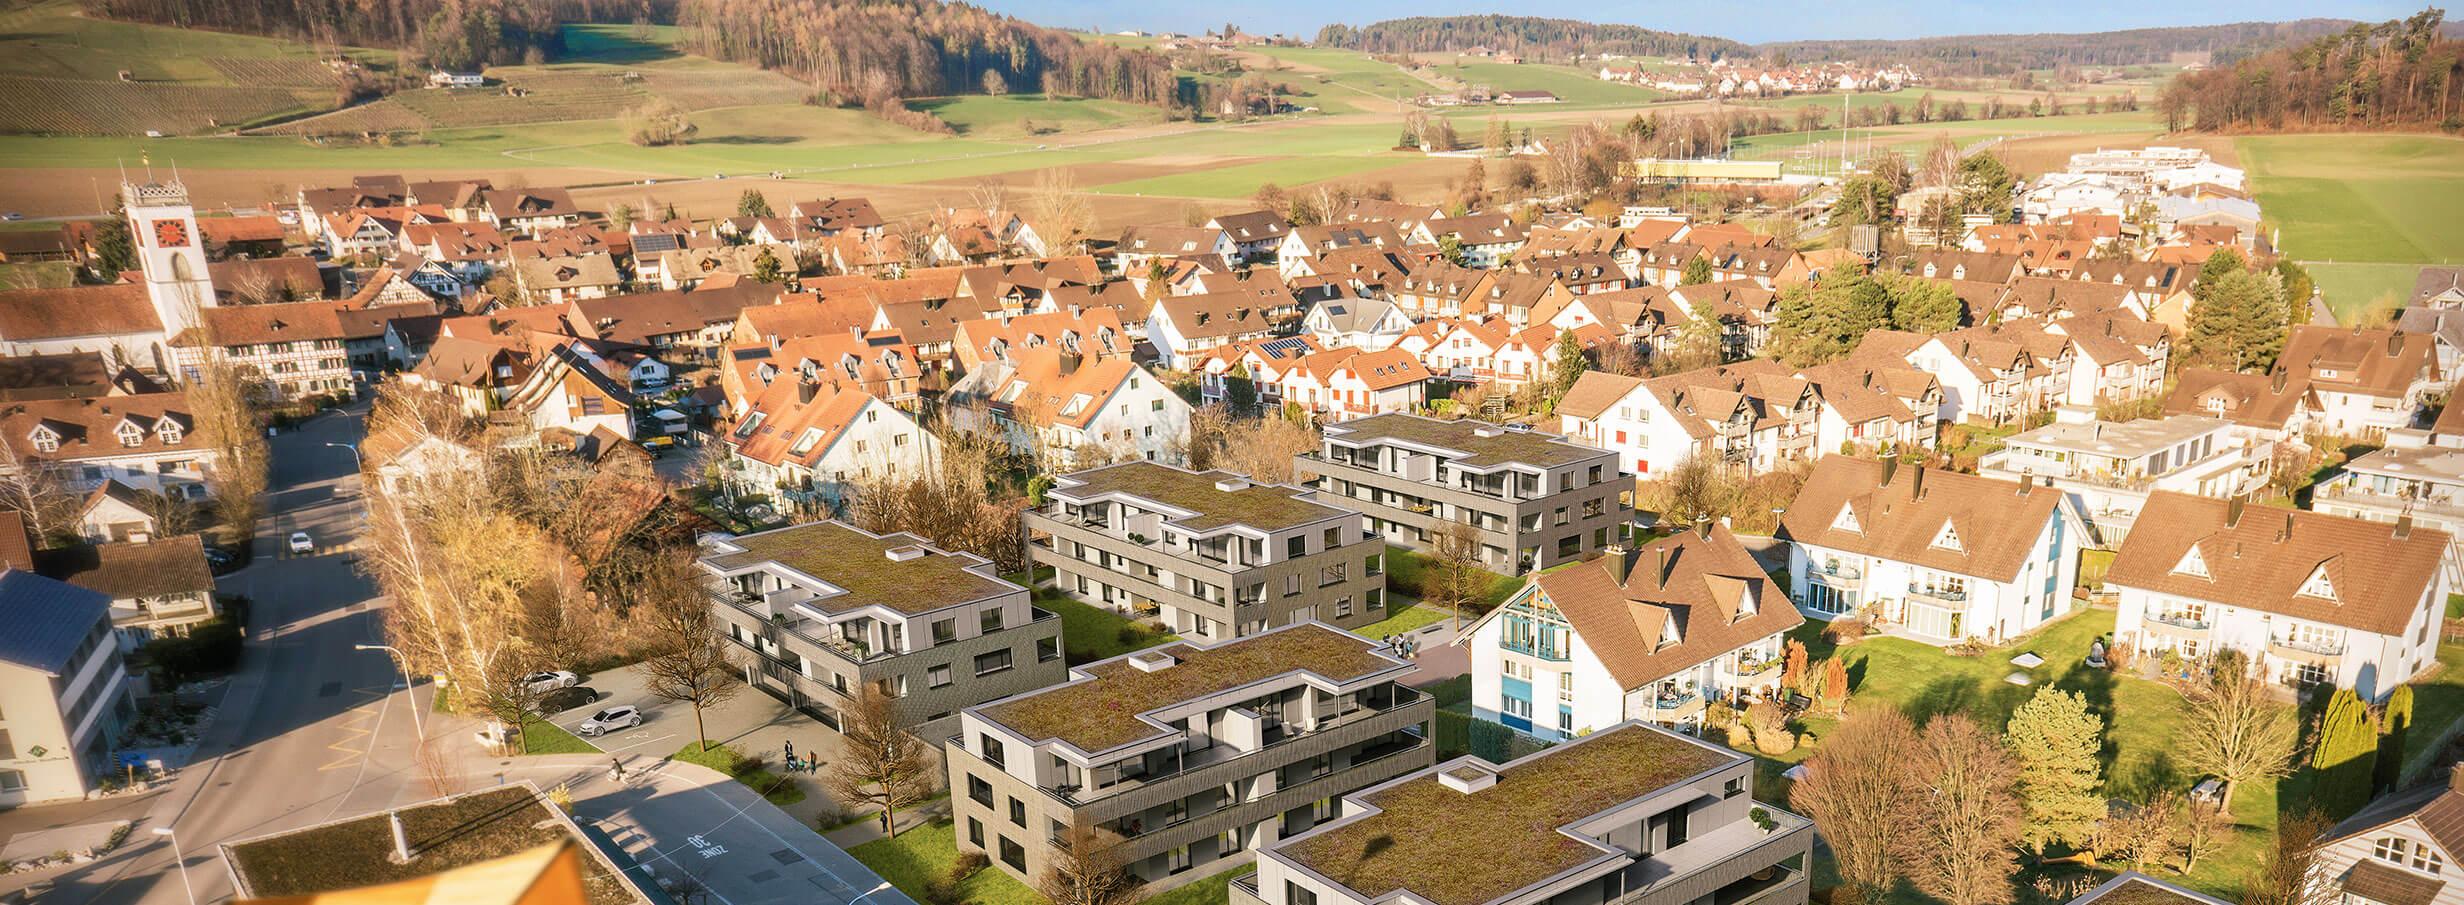 Luftaufnahmen Drohne Winterthur Sagi Neftenbach